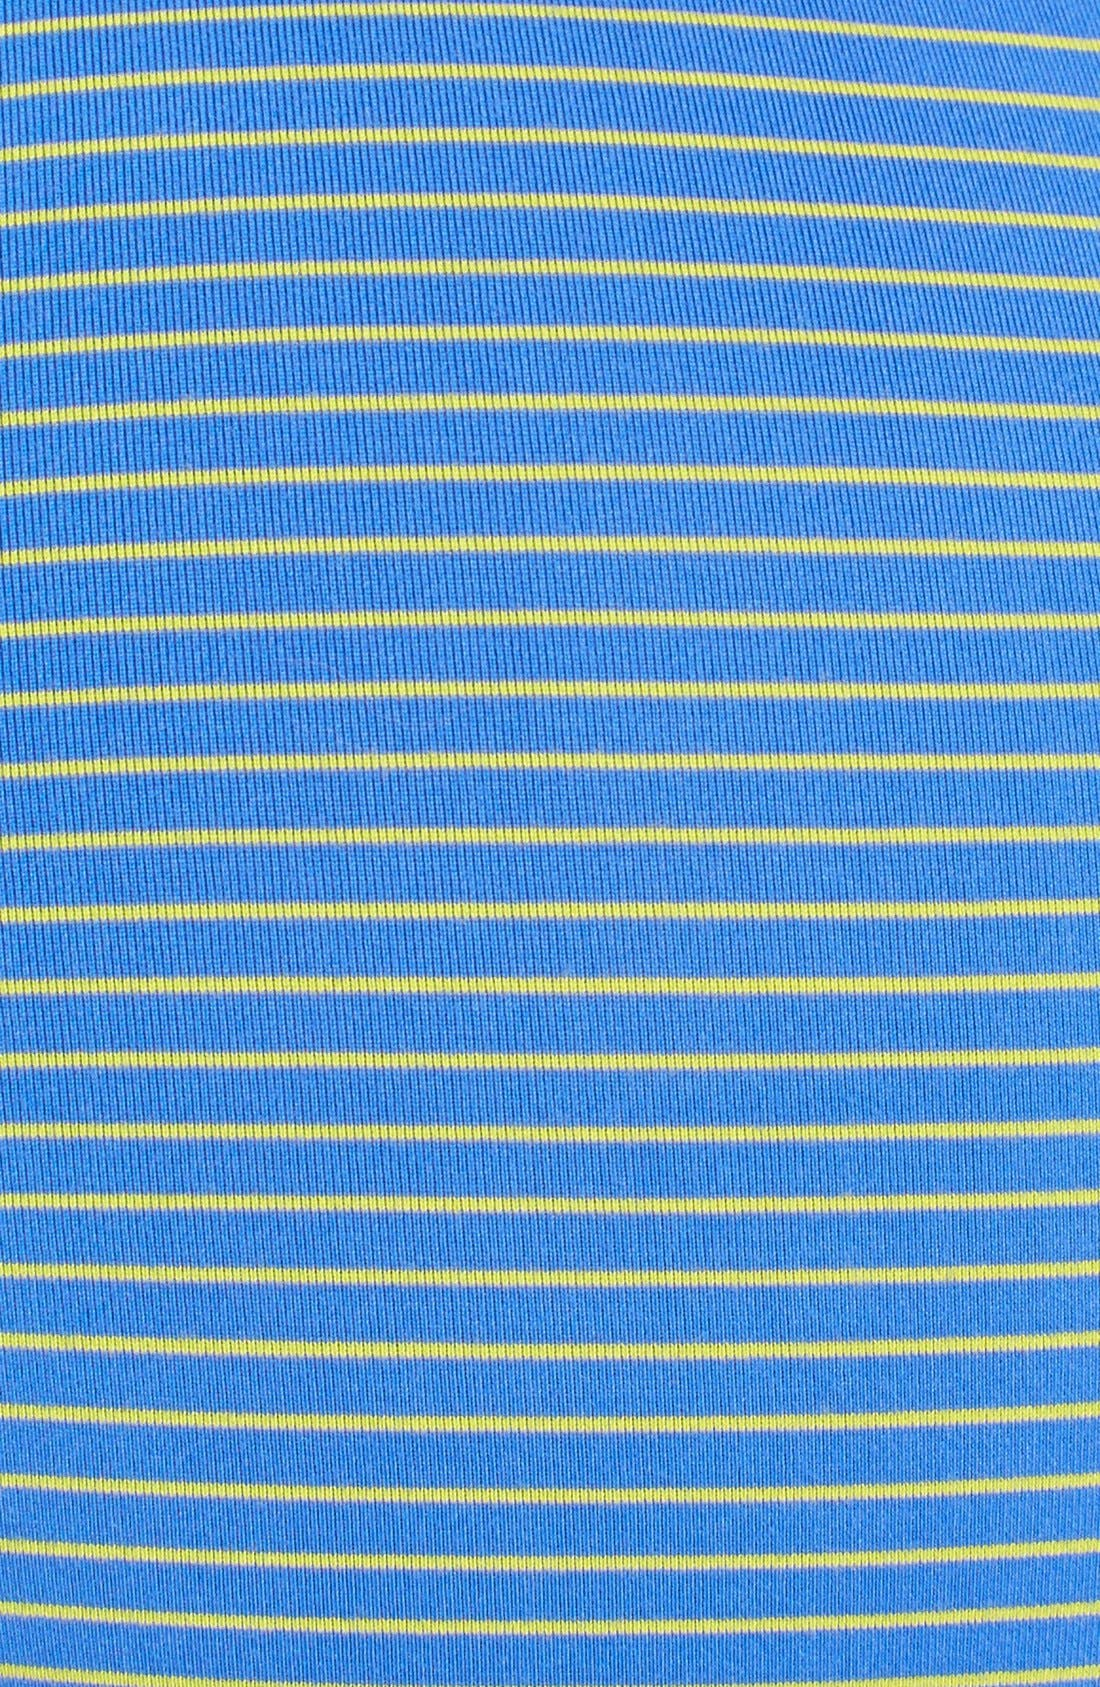 'Steel - U2715' Microfiber Hip Briefs,                             Alternate thumbnail 91, color,